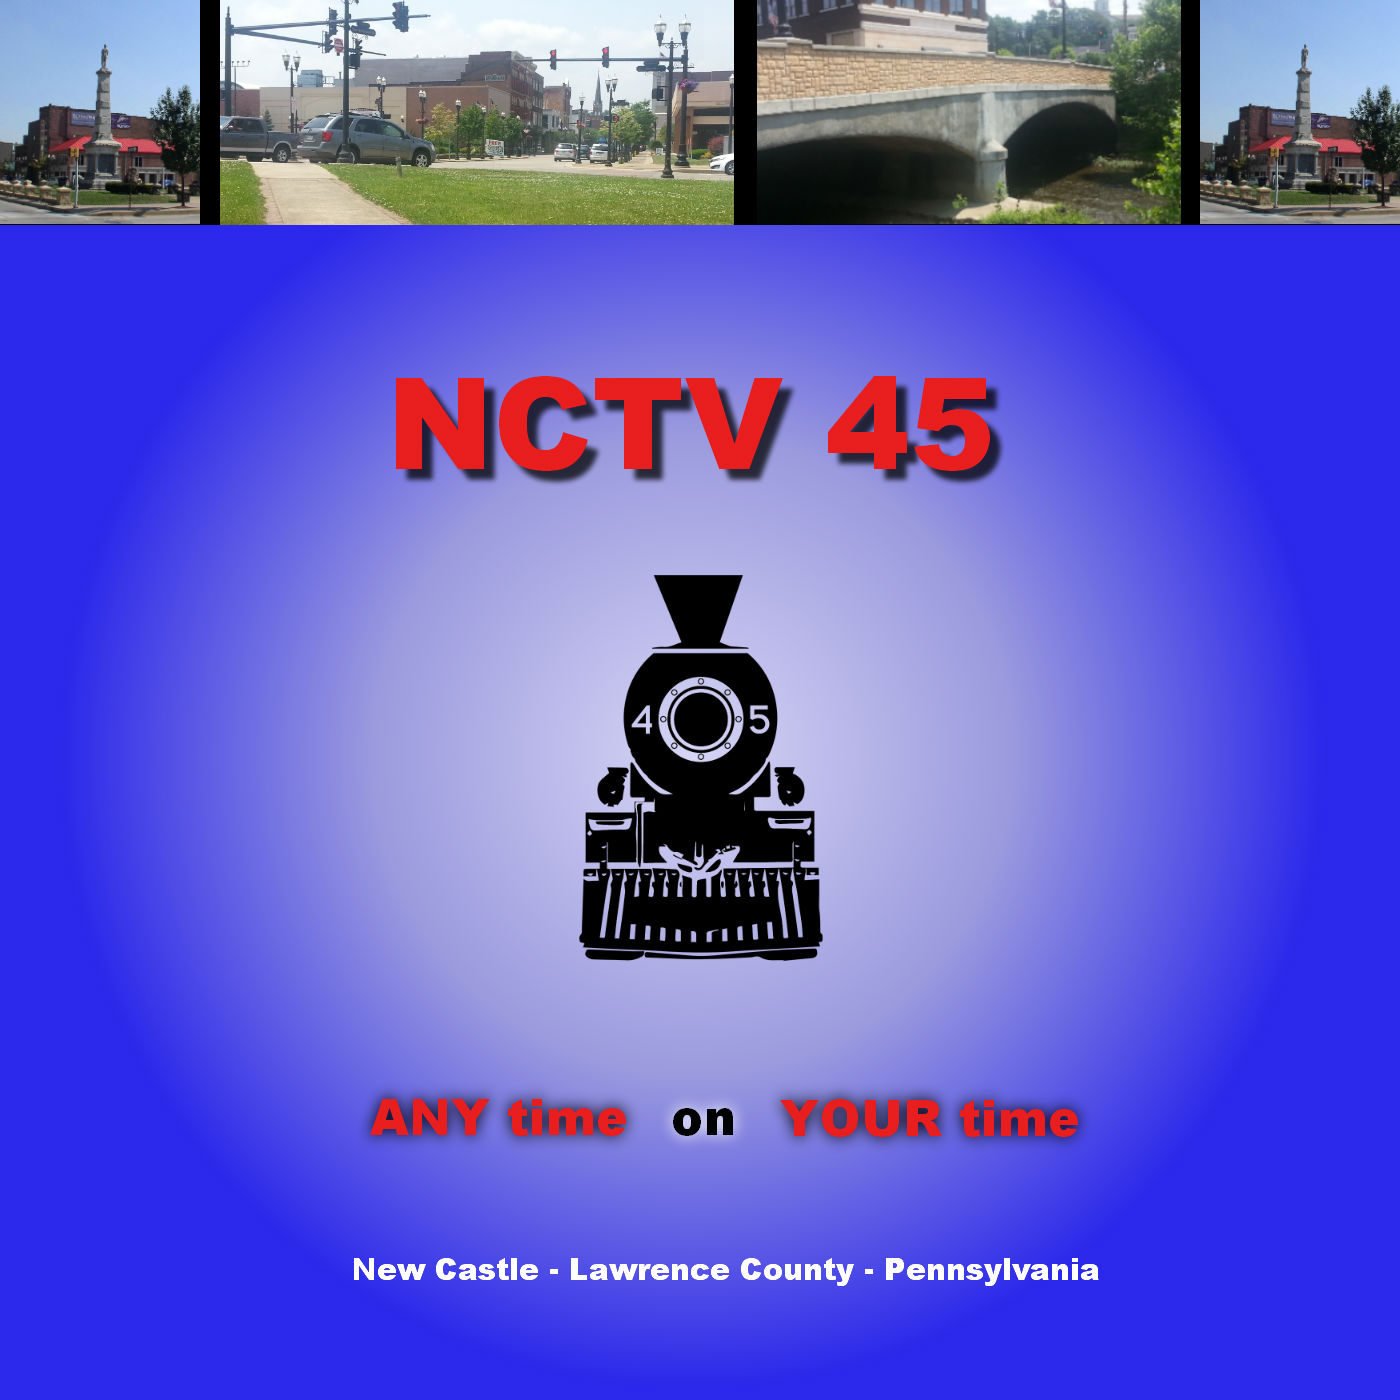 NCTV45 - The Train - New Castle, PA show art